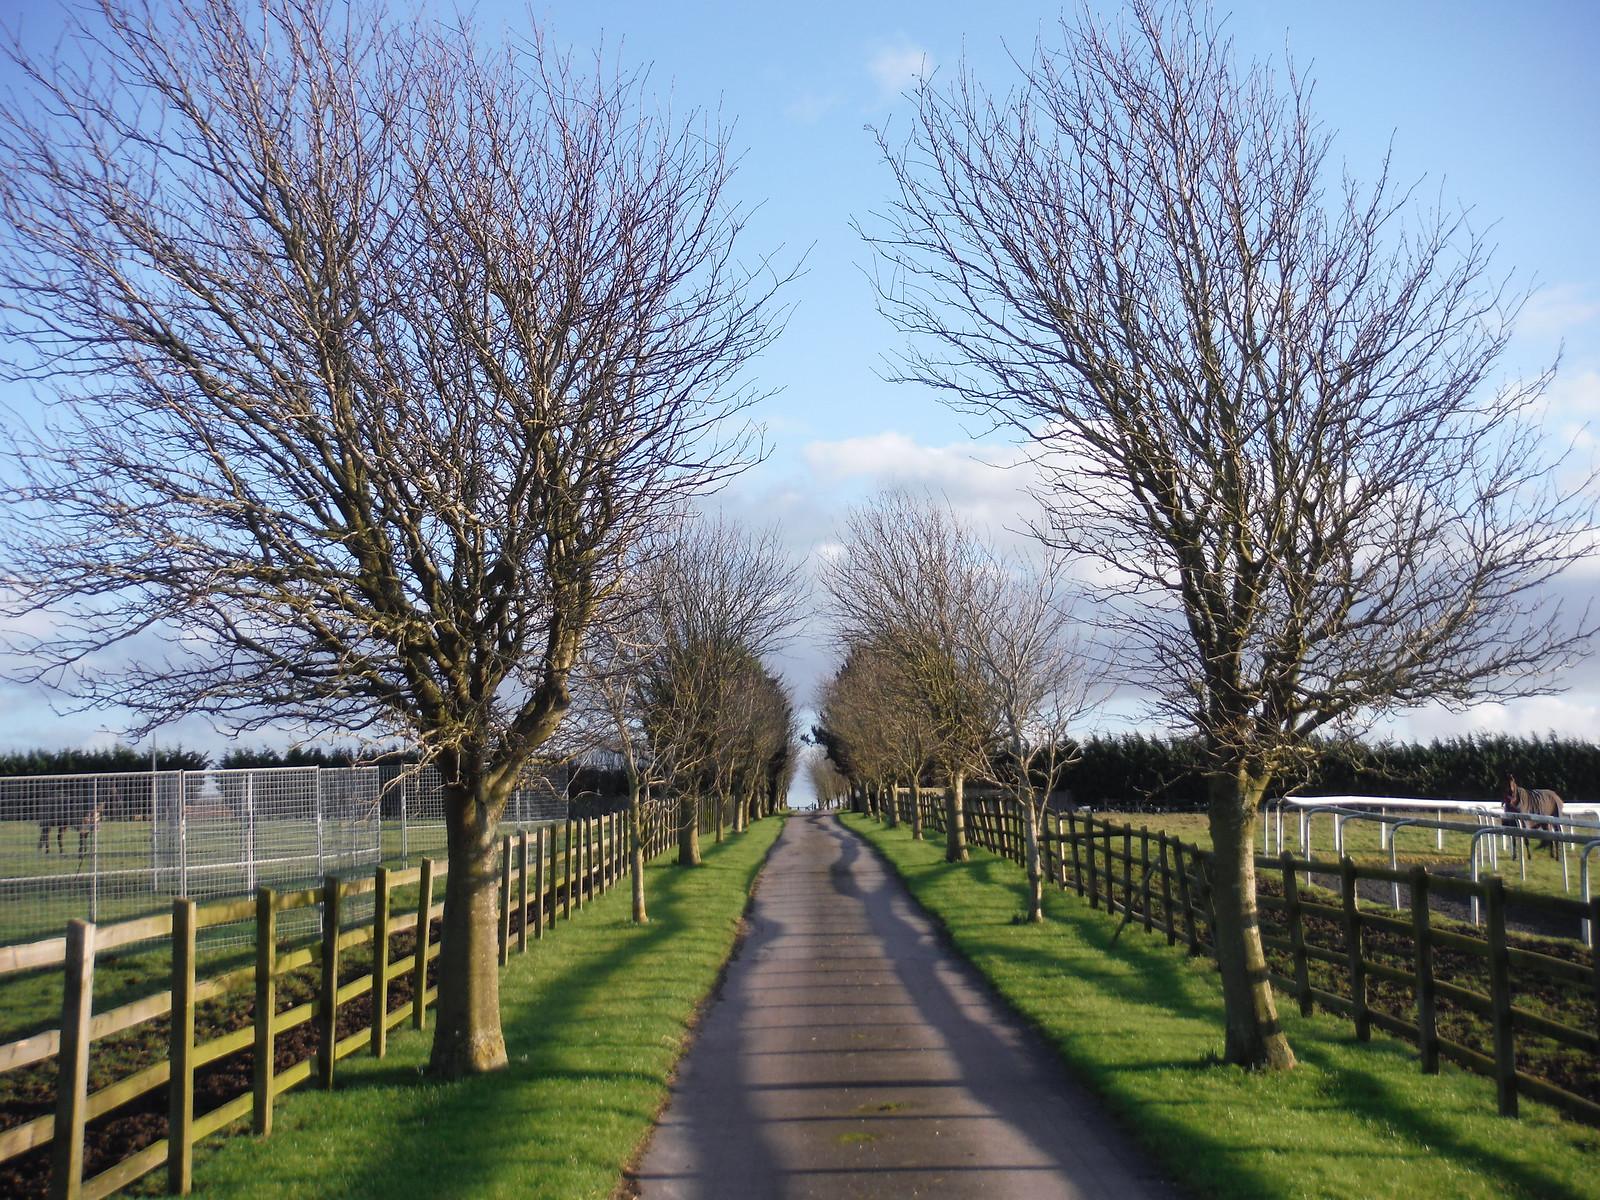 Musk Hill Stud Farm, Driveway SWC Walk 191 Haddenham Circular (via Brill)